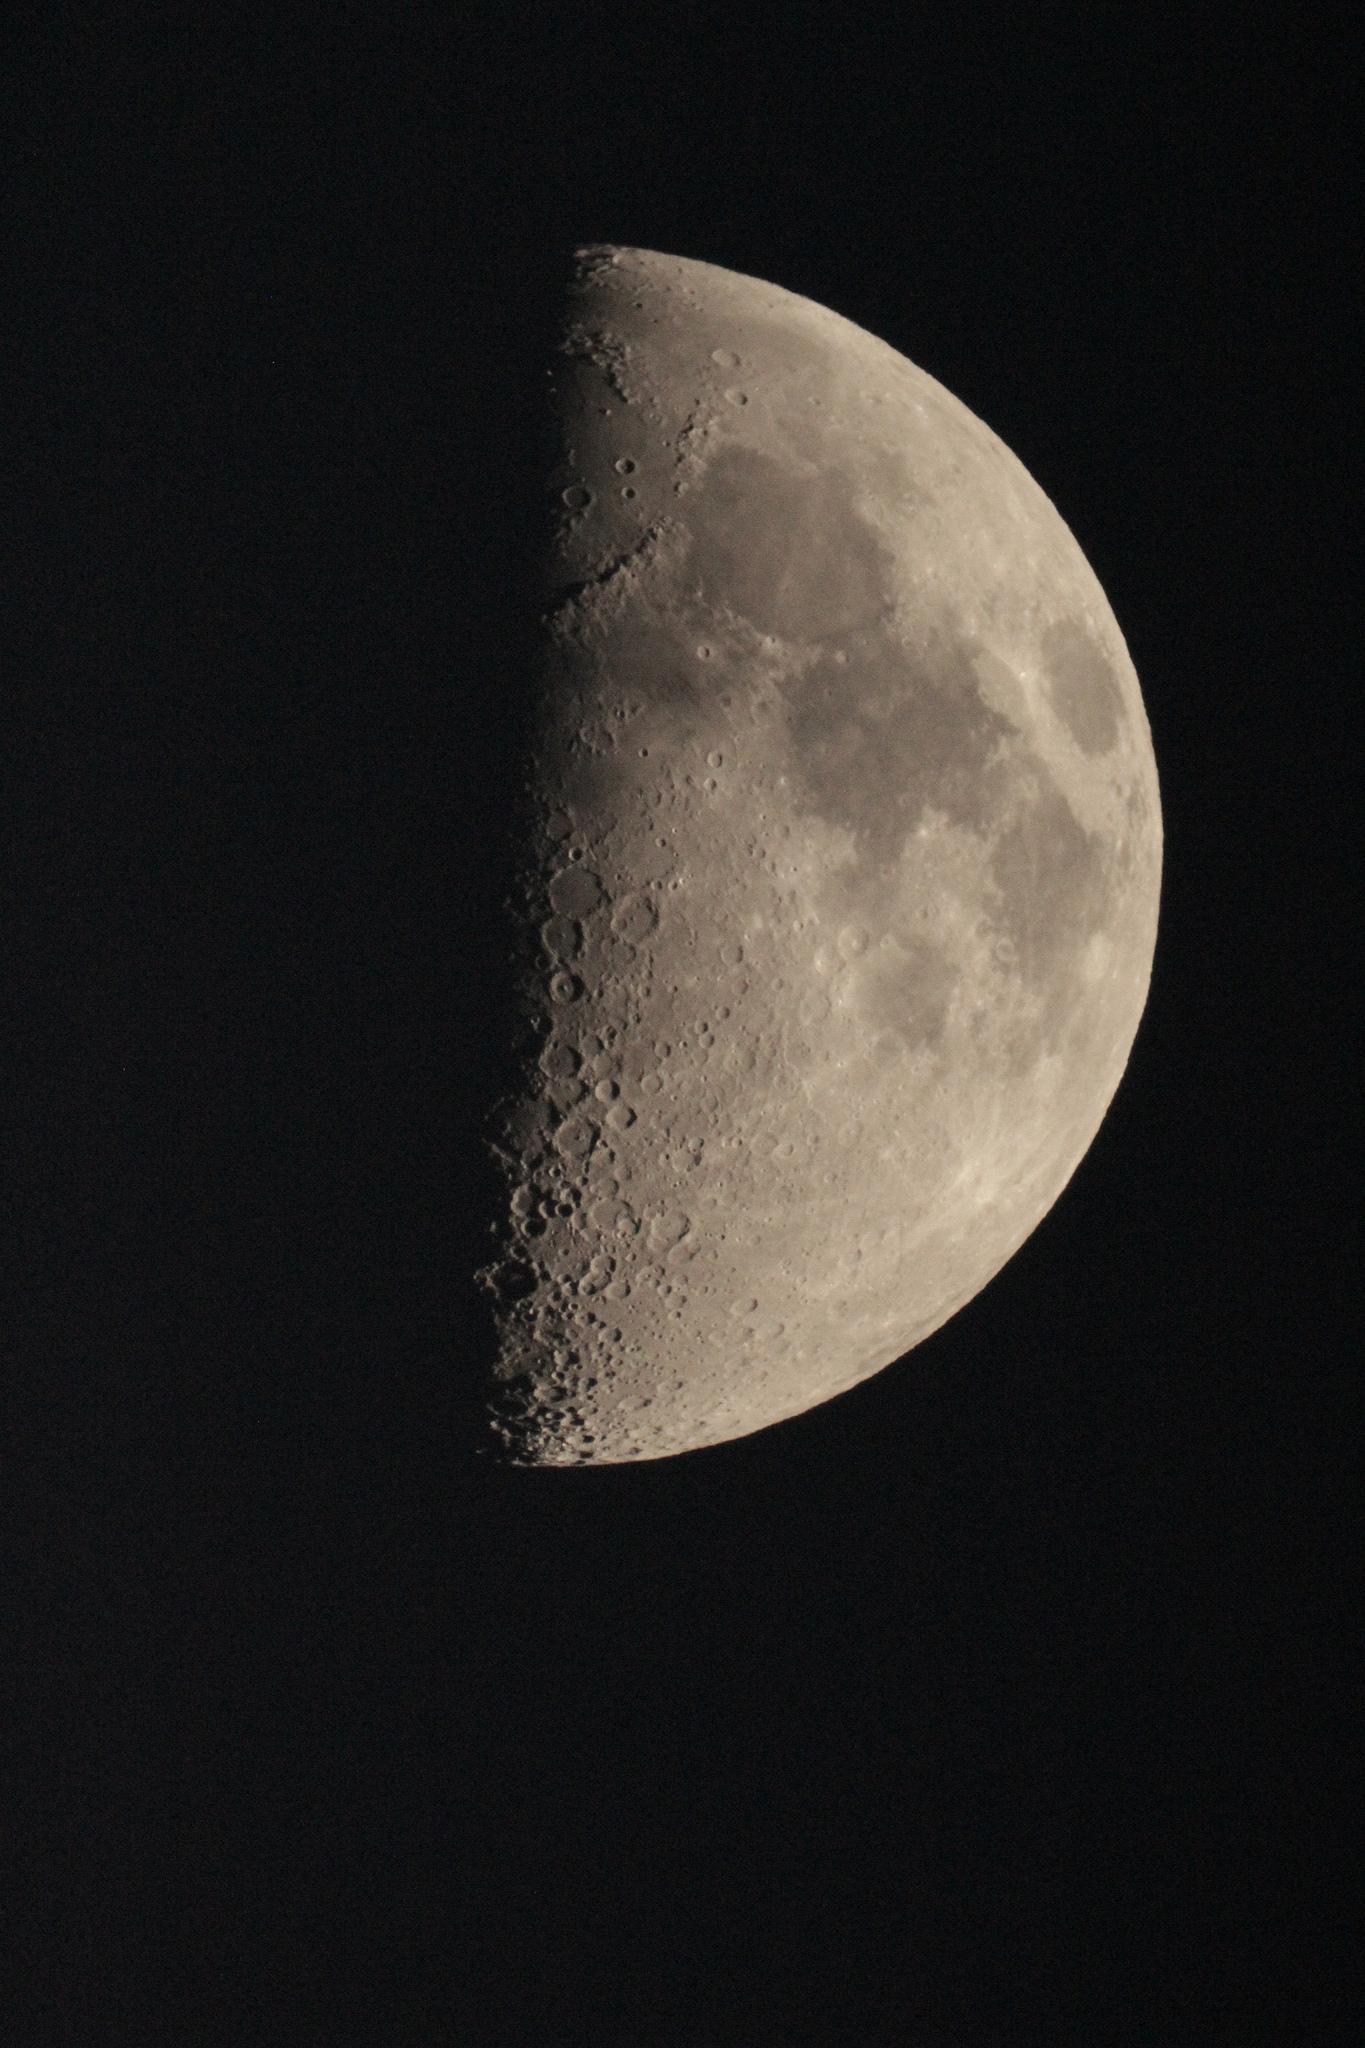 Mond, Dortmund 09.09.2016, 20:11h UTC+2, Skywatcher MC 127/1500, Canon EOS1200D, ISO 6400, 1/1000s